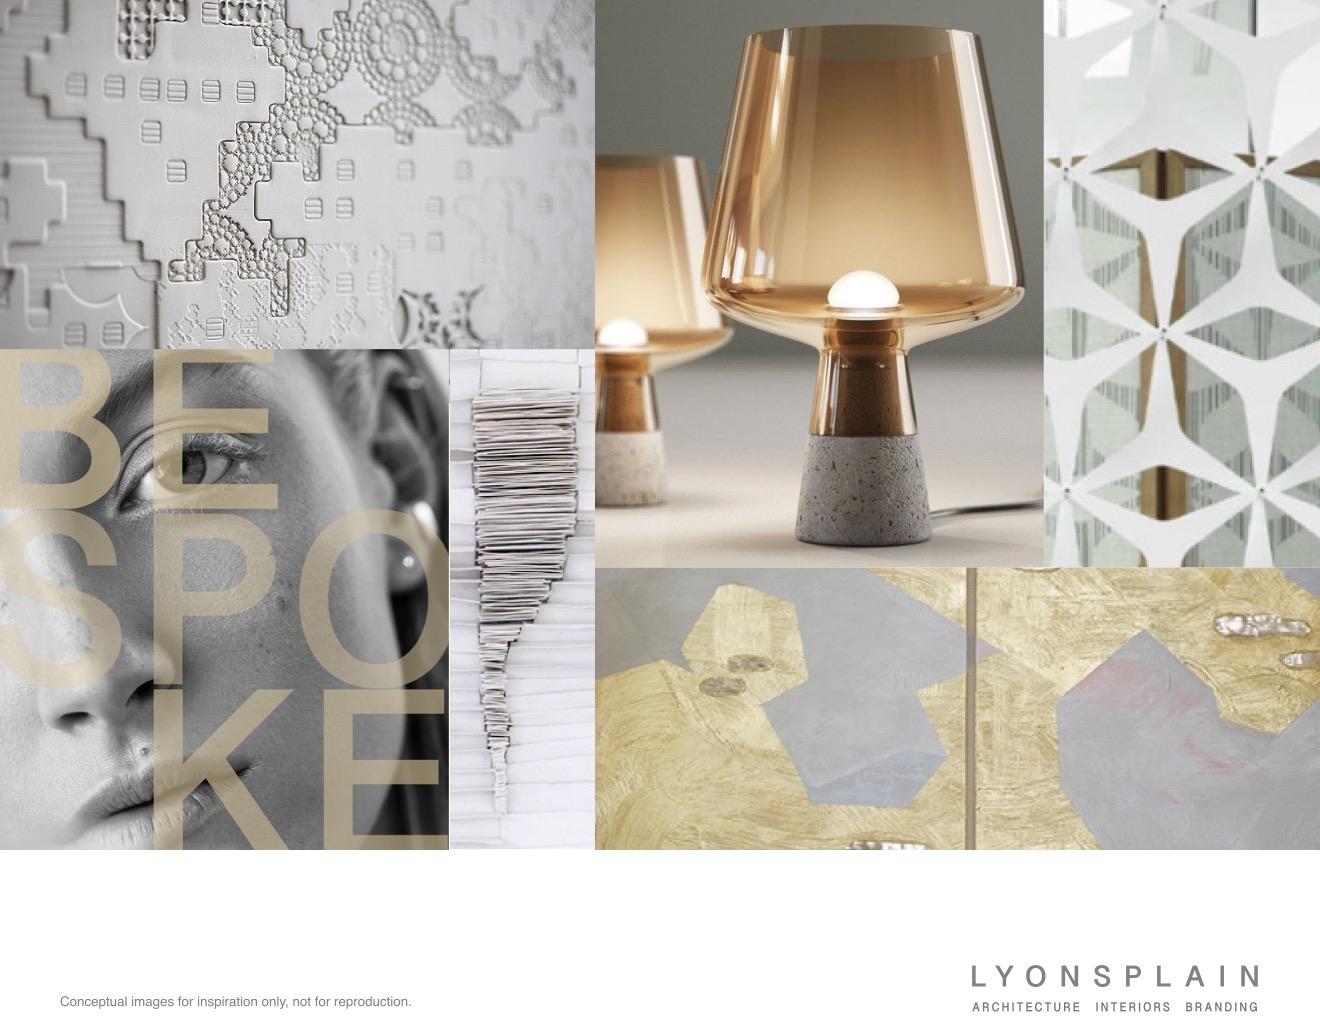 LPA_Montauk Beach Resort Concept Design _02.28.18 Page 012.jpg